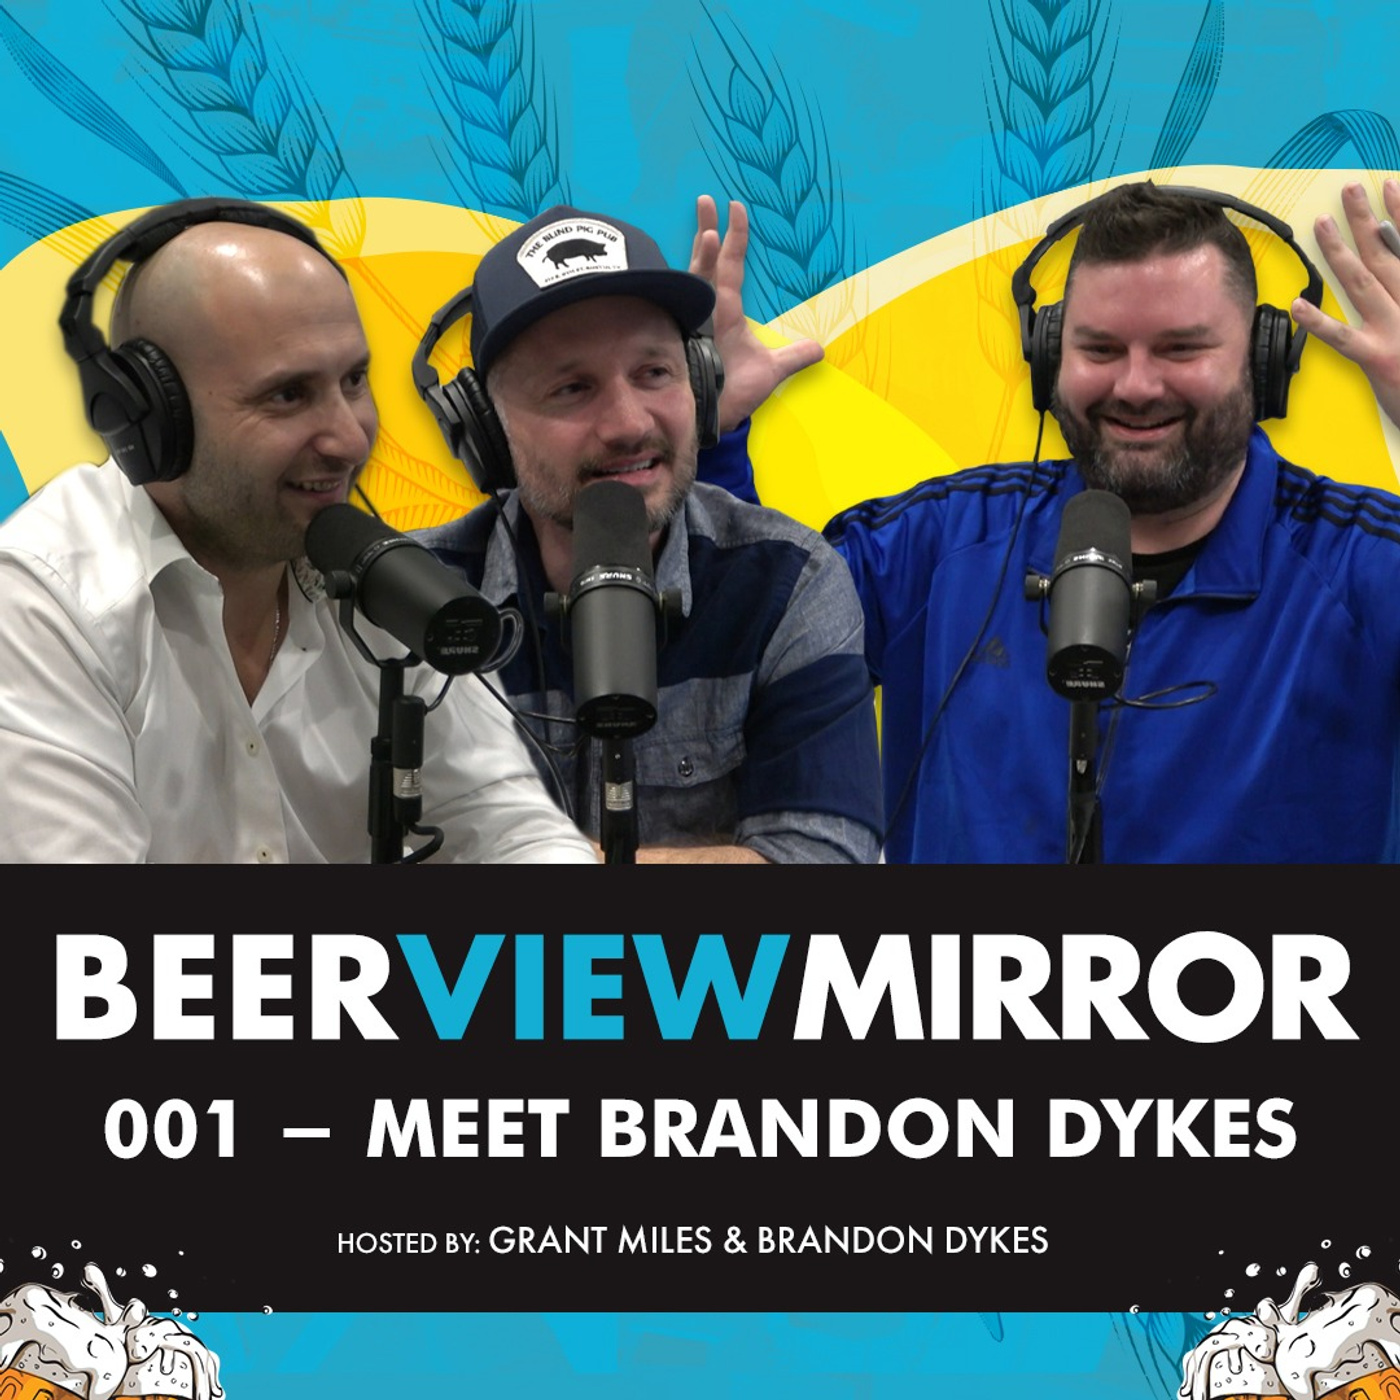 Beer View Mirror 001 Lets Have a Beer, Meet Brandon Dykes